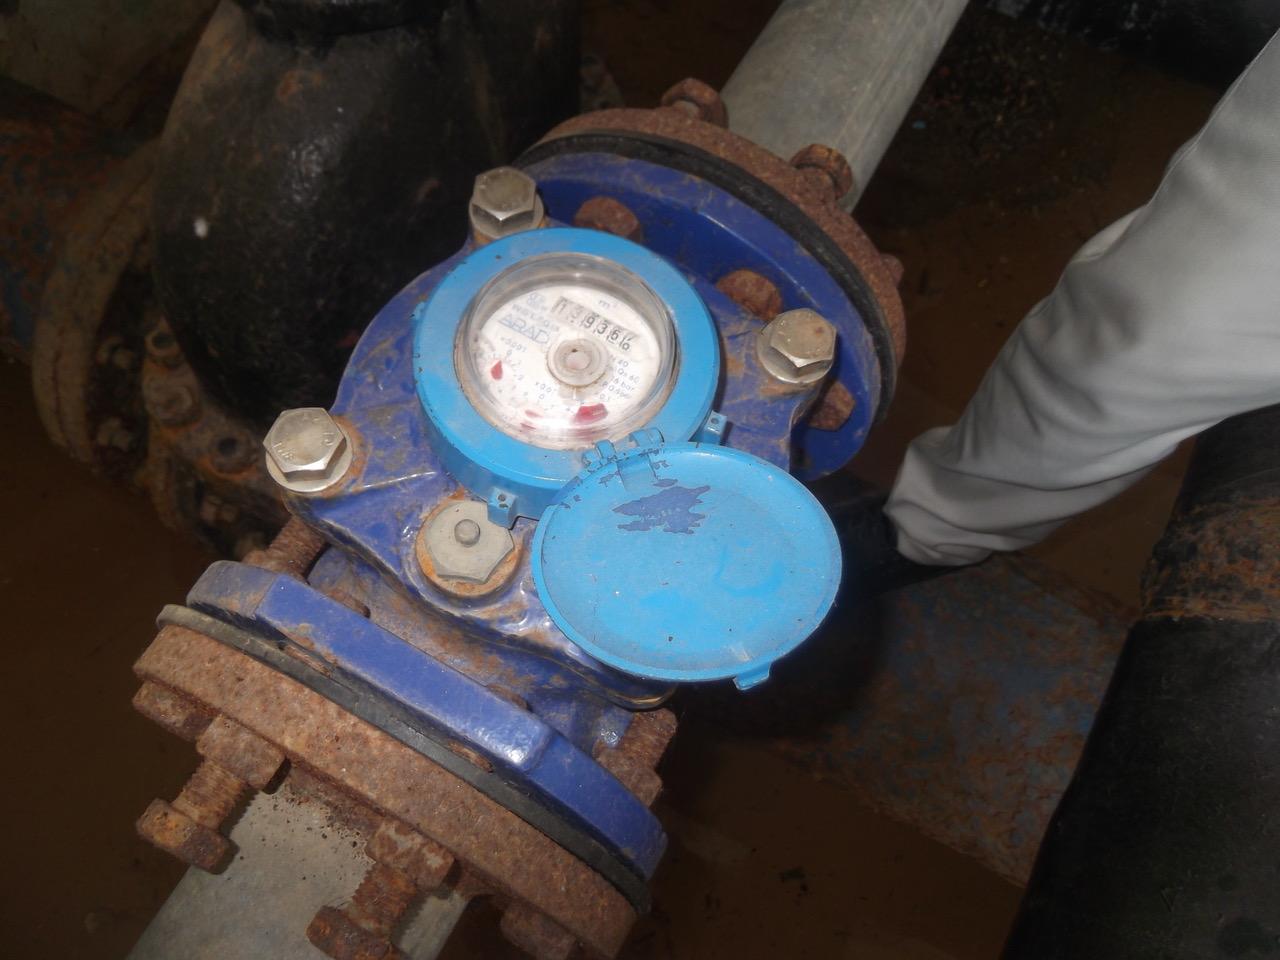 RW-2-REG: Training on water accounting